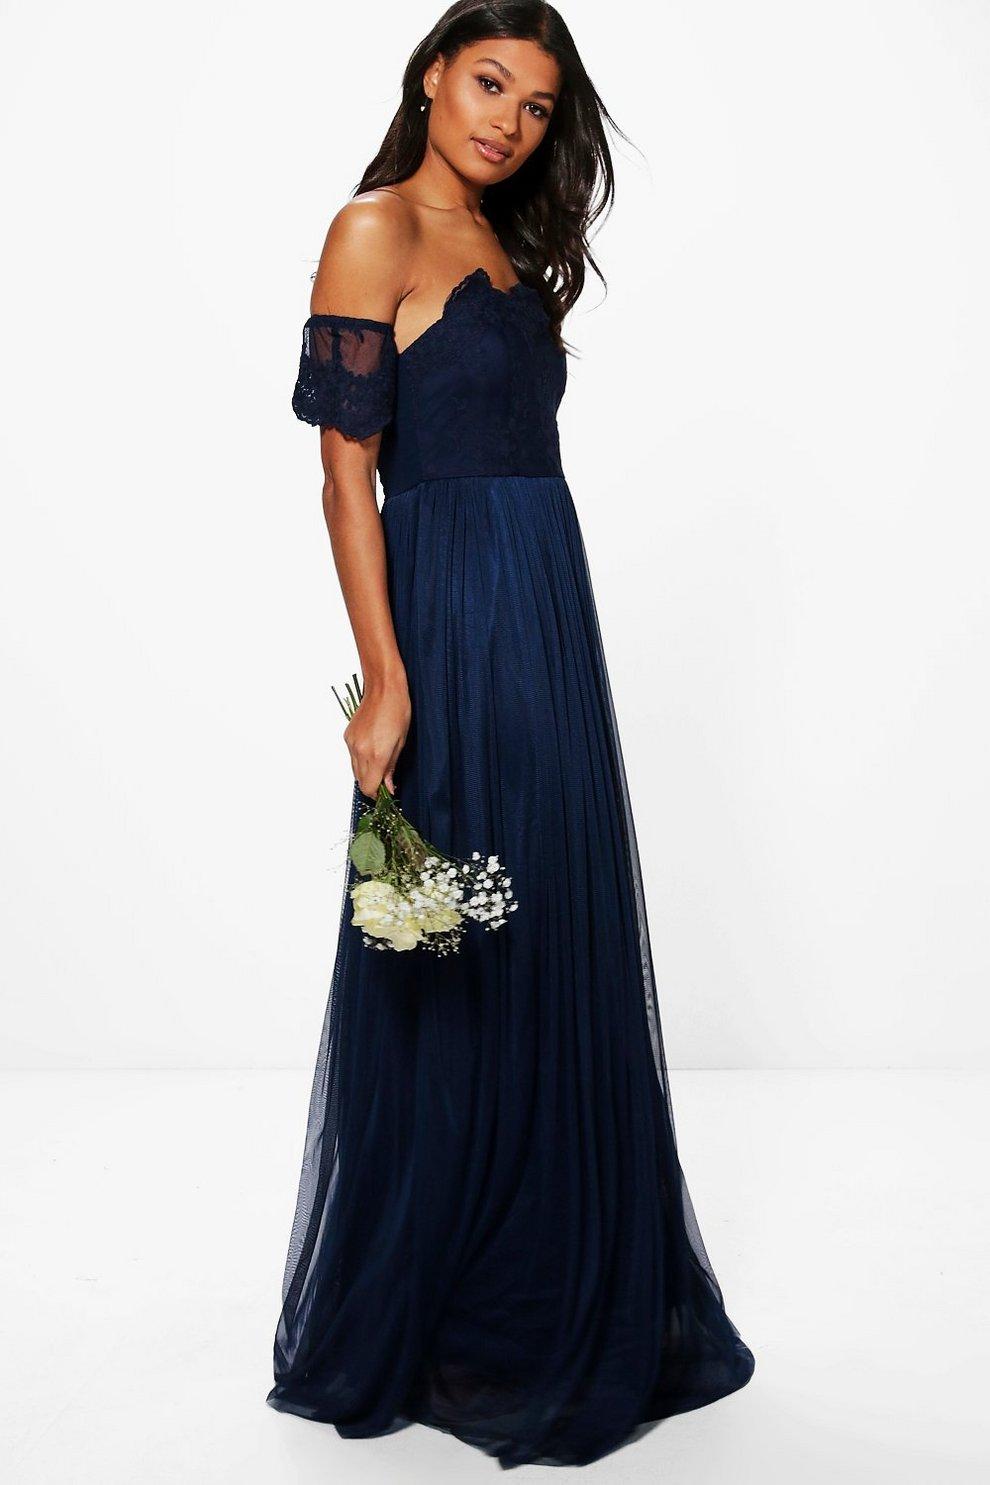 666260ea1fd5 Boutique Lace Off Shoulder Maxi Dress